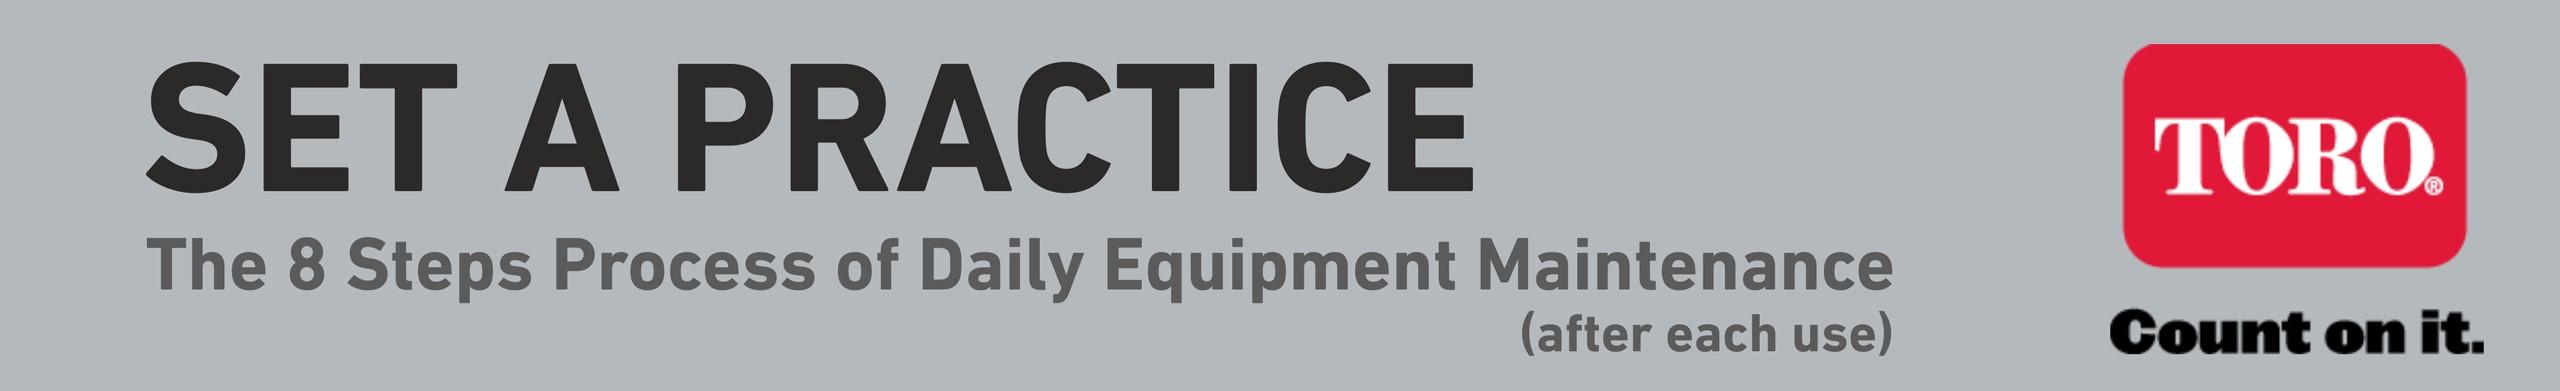 8 steps maintenance practice